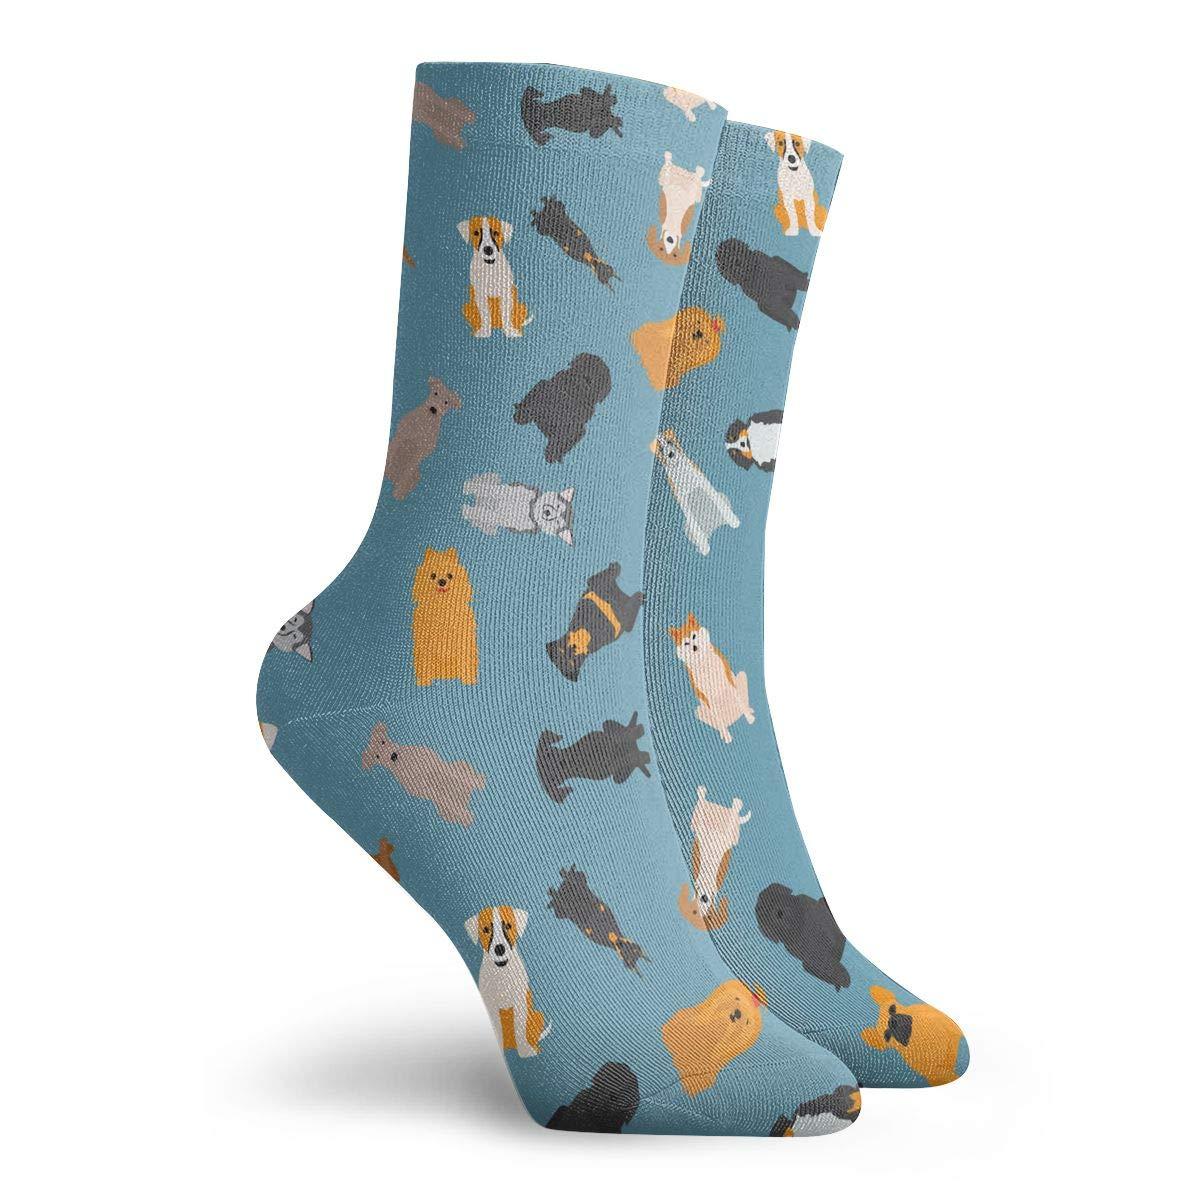 Unisex Different Breed Dog Art Athletic Quarter Ankle Print Breathable Hiking Running Socks